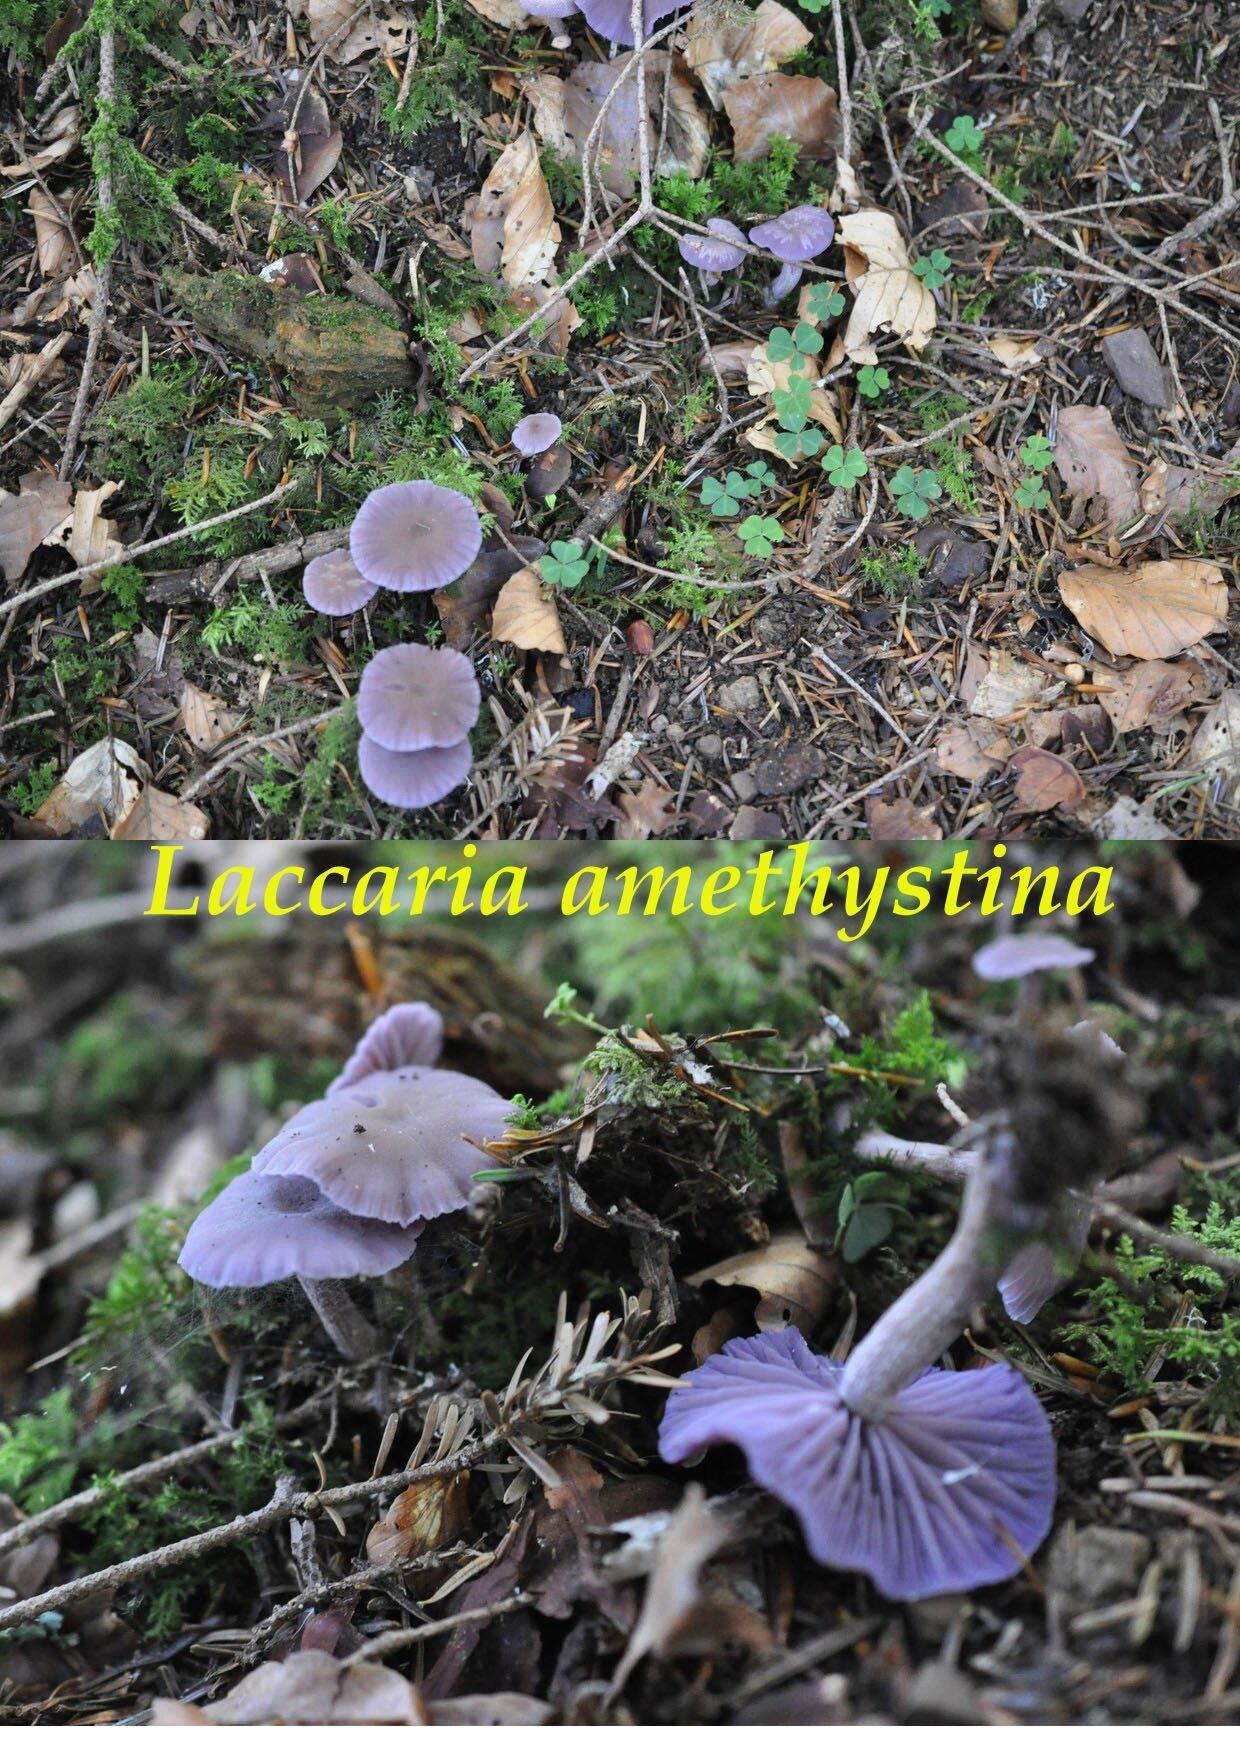 Laccaria amethystina